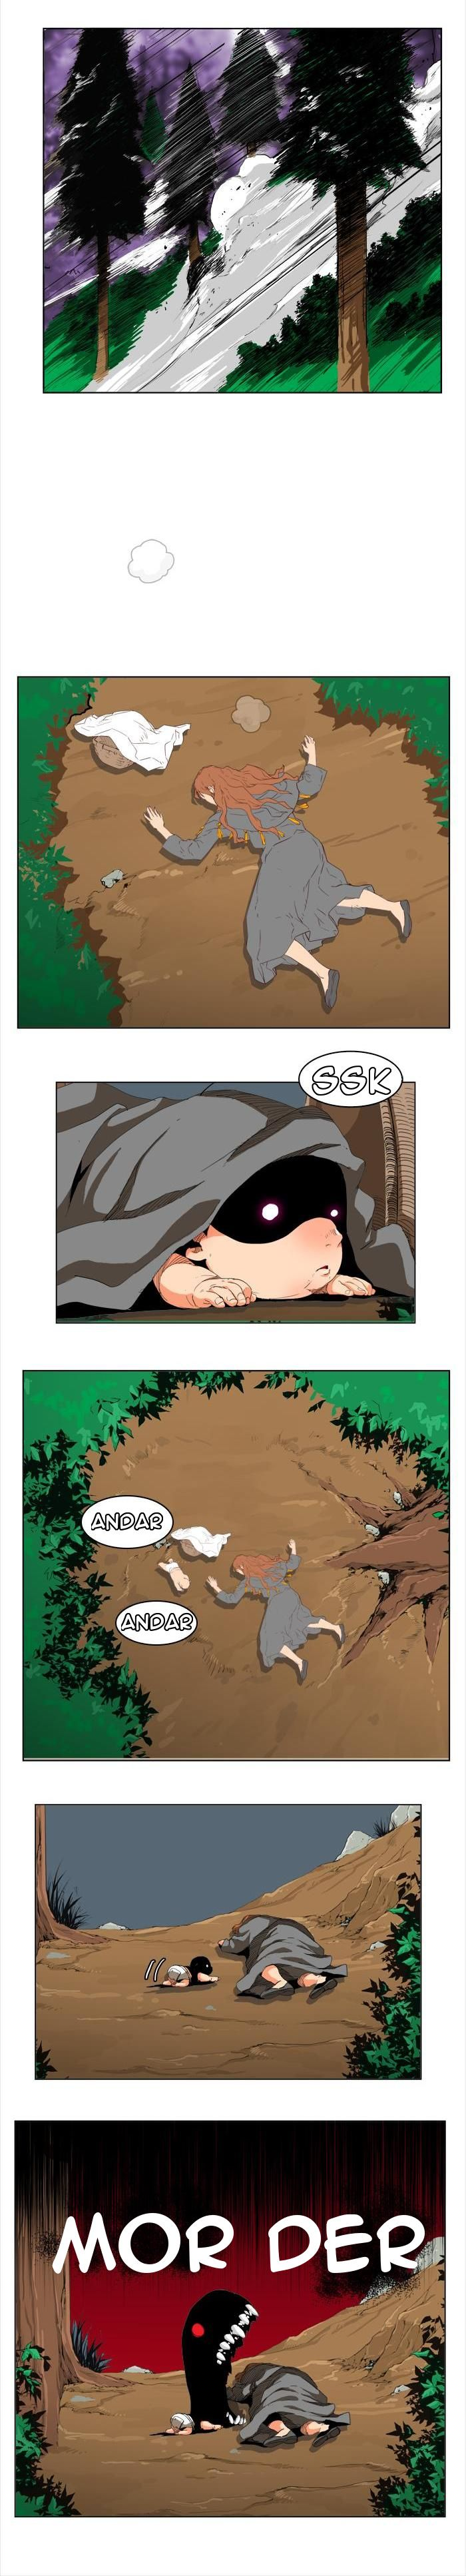 http://c5.ninemanga.com/es_manga/pic2/37/485/488888/f070e4c6ed57a7f1f04a22fdd630c465.jpg Page 5